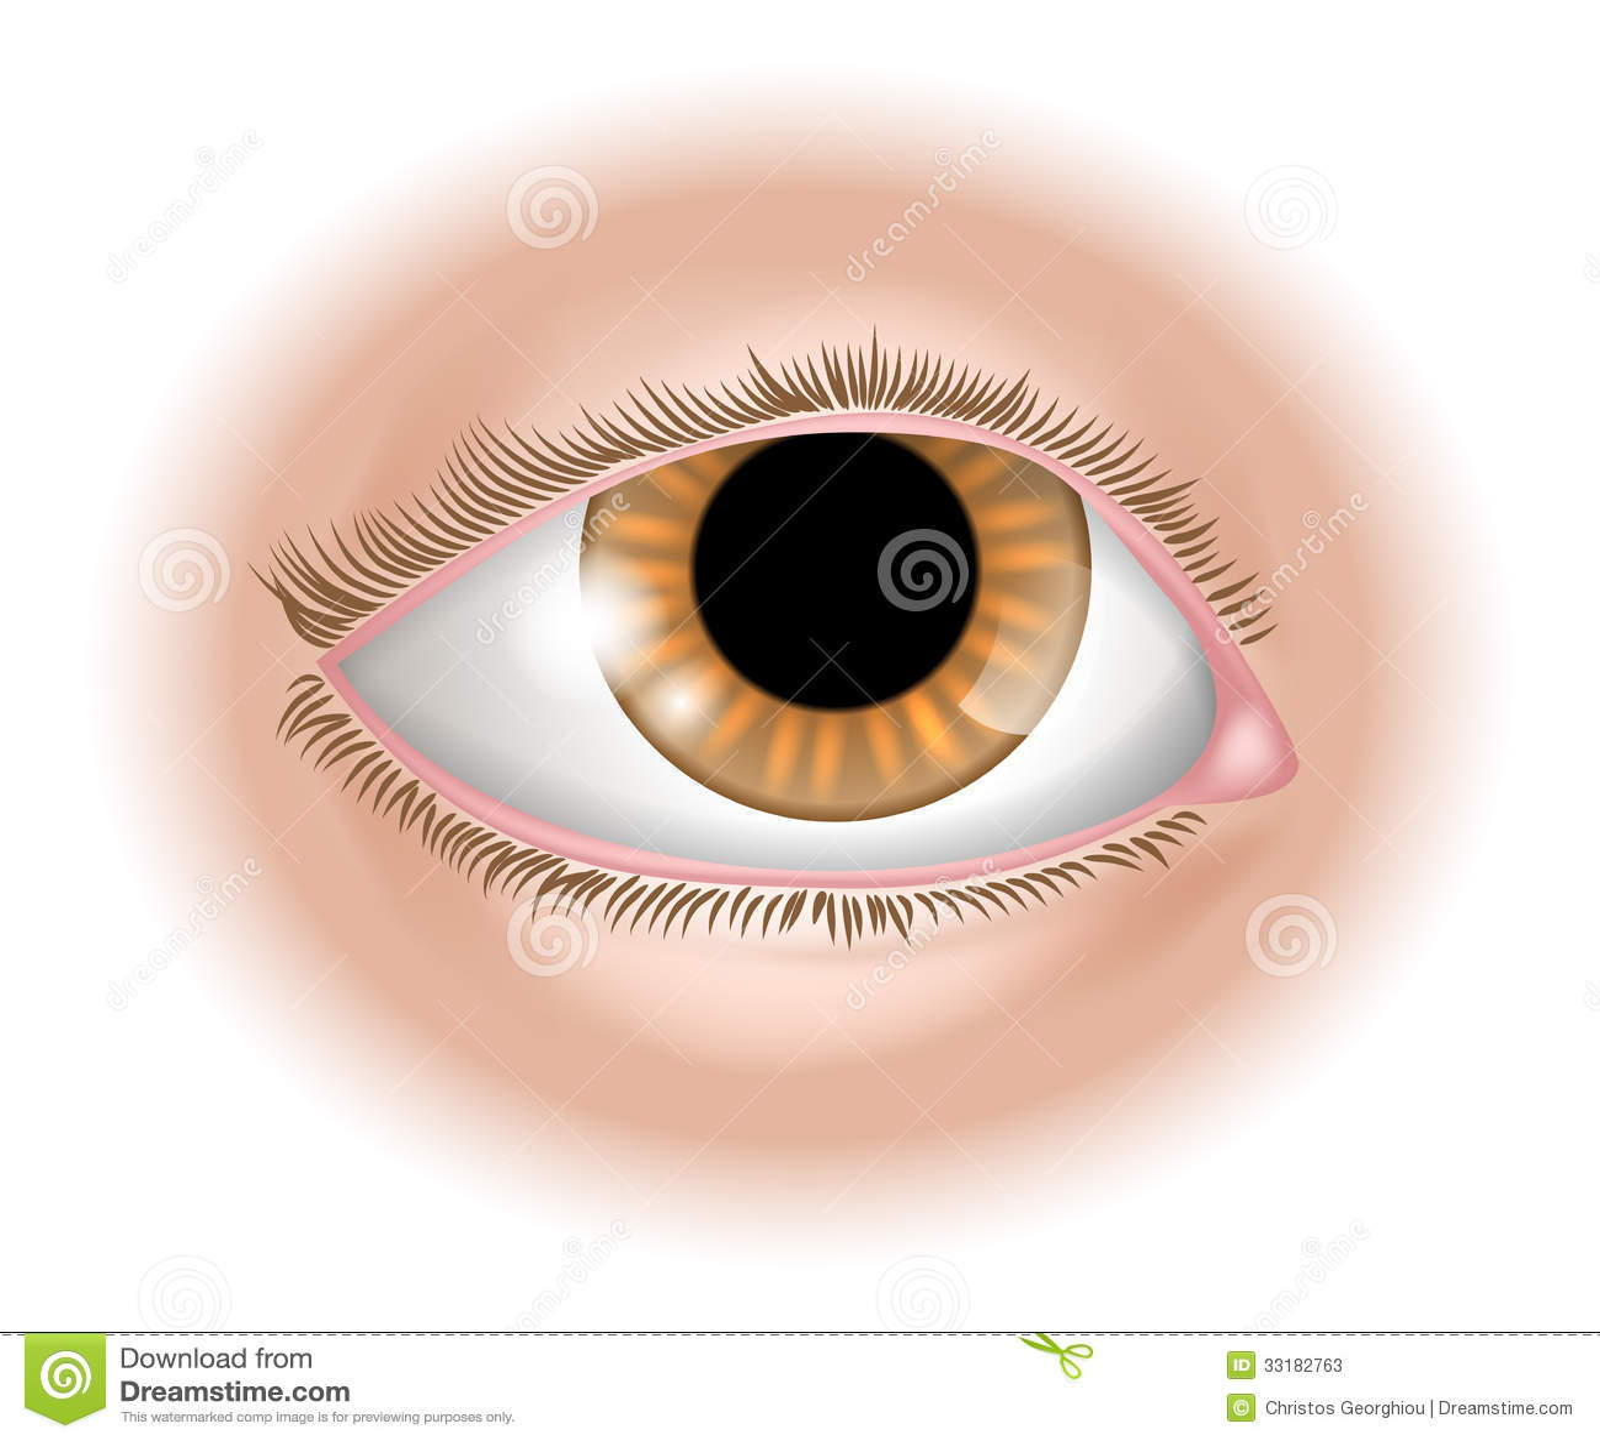 Eye Body Part Illustration Stock Photos